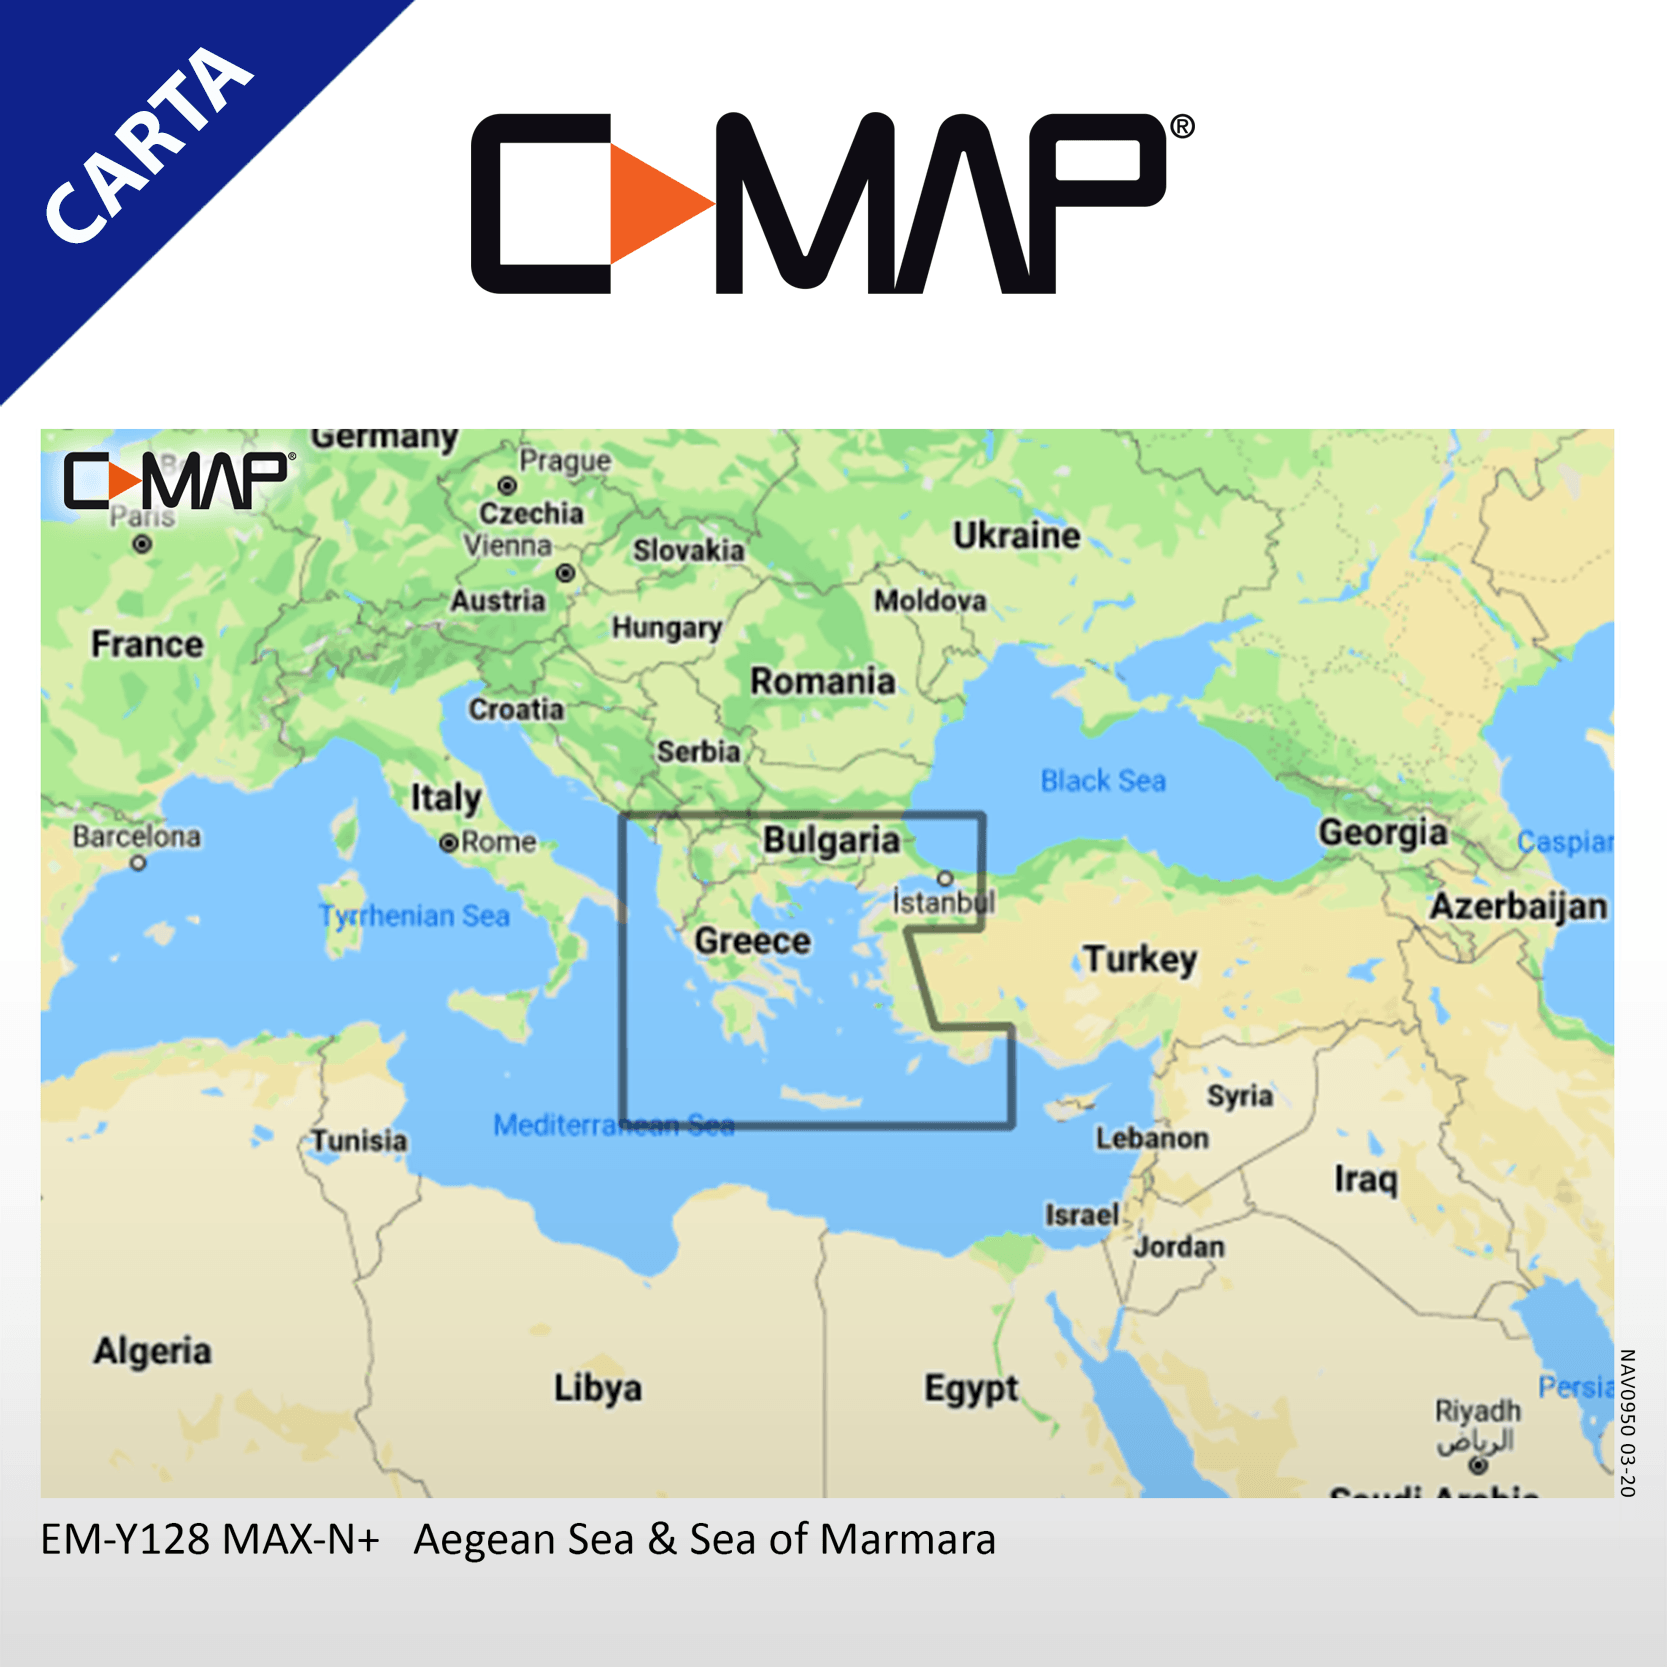 C-MAP MAX-N+ EM-Y128